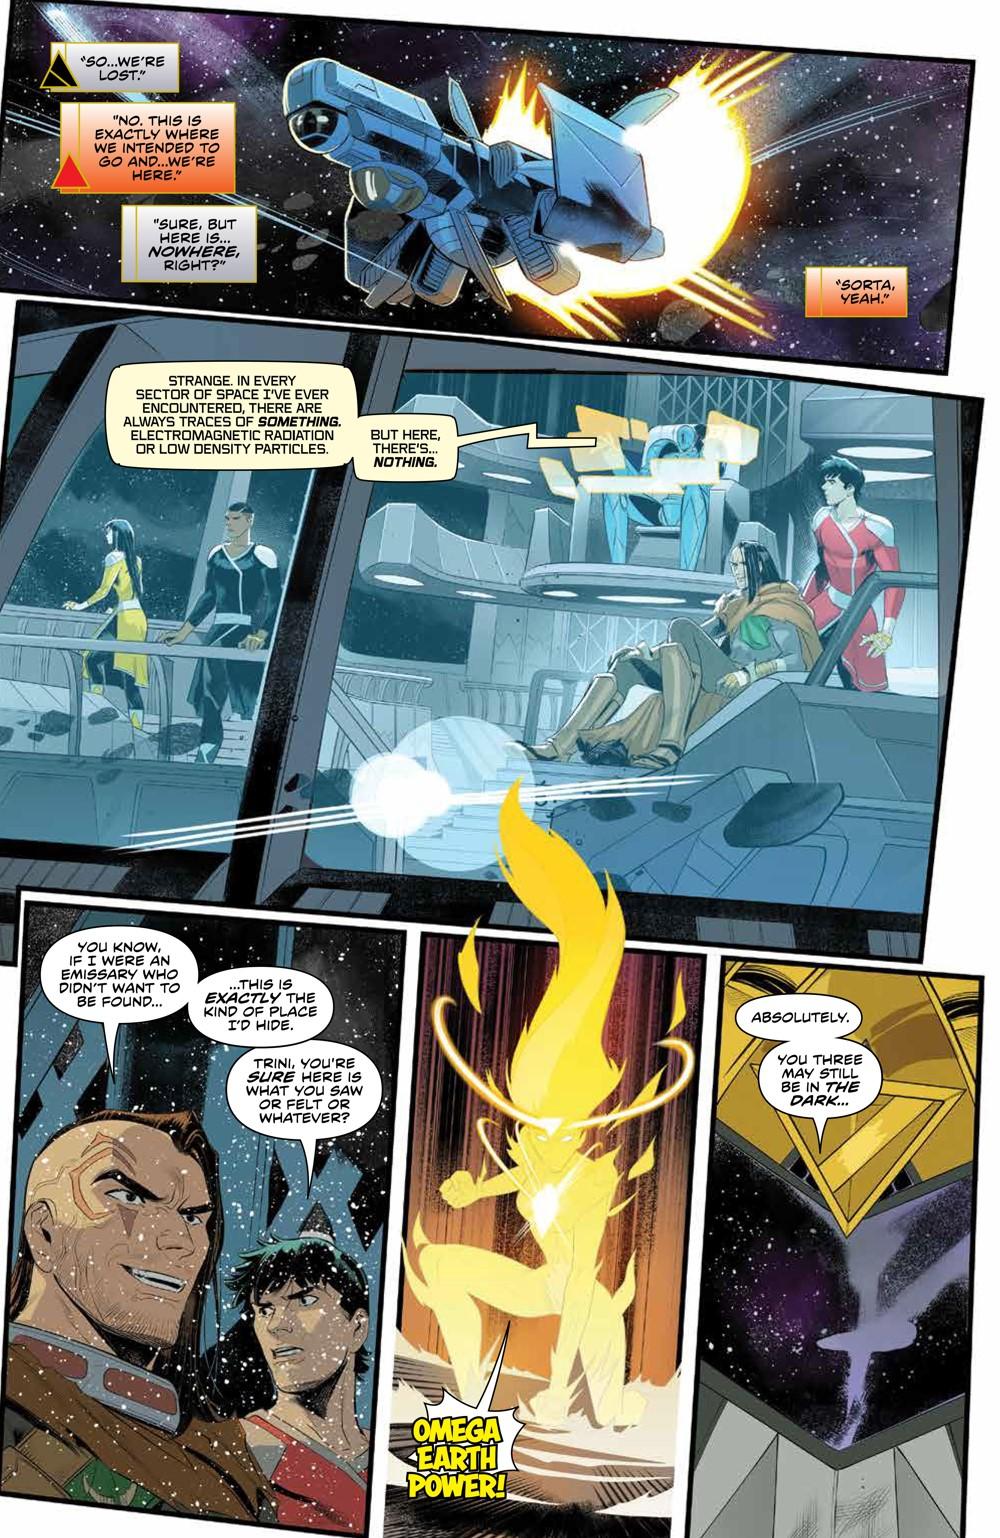 PowerRangers_011_PRESS_3 ComicList Previews: POWER RANGERS #11